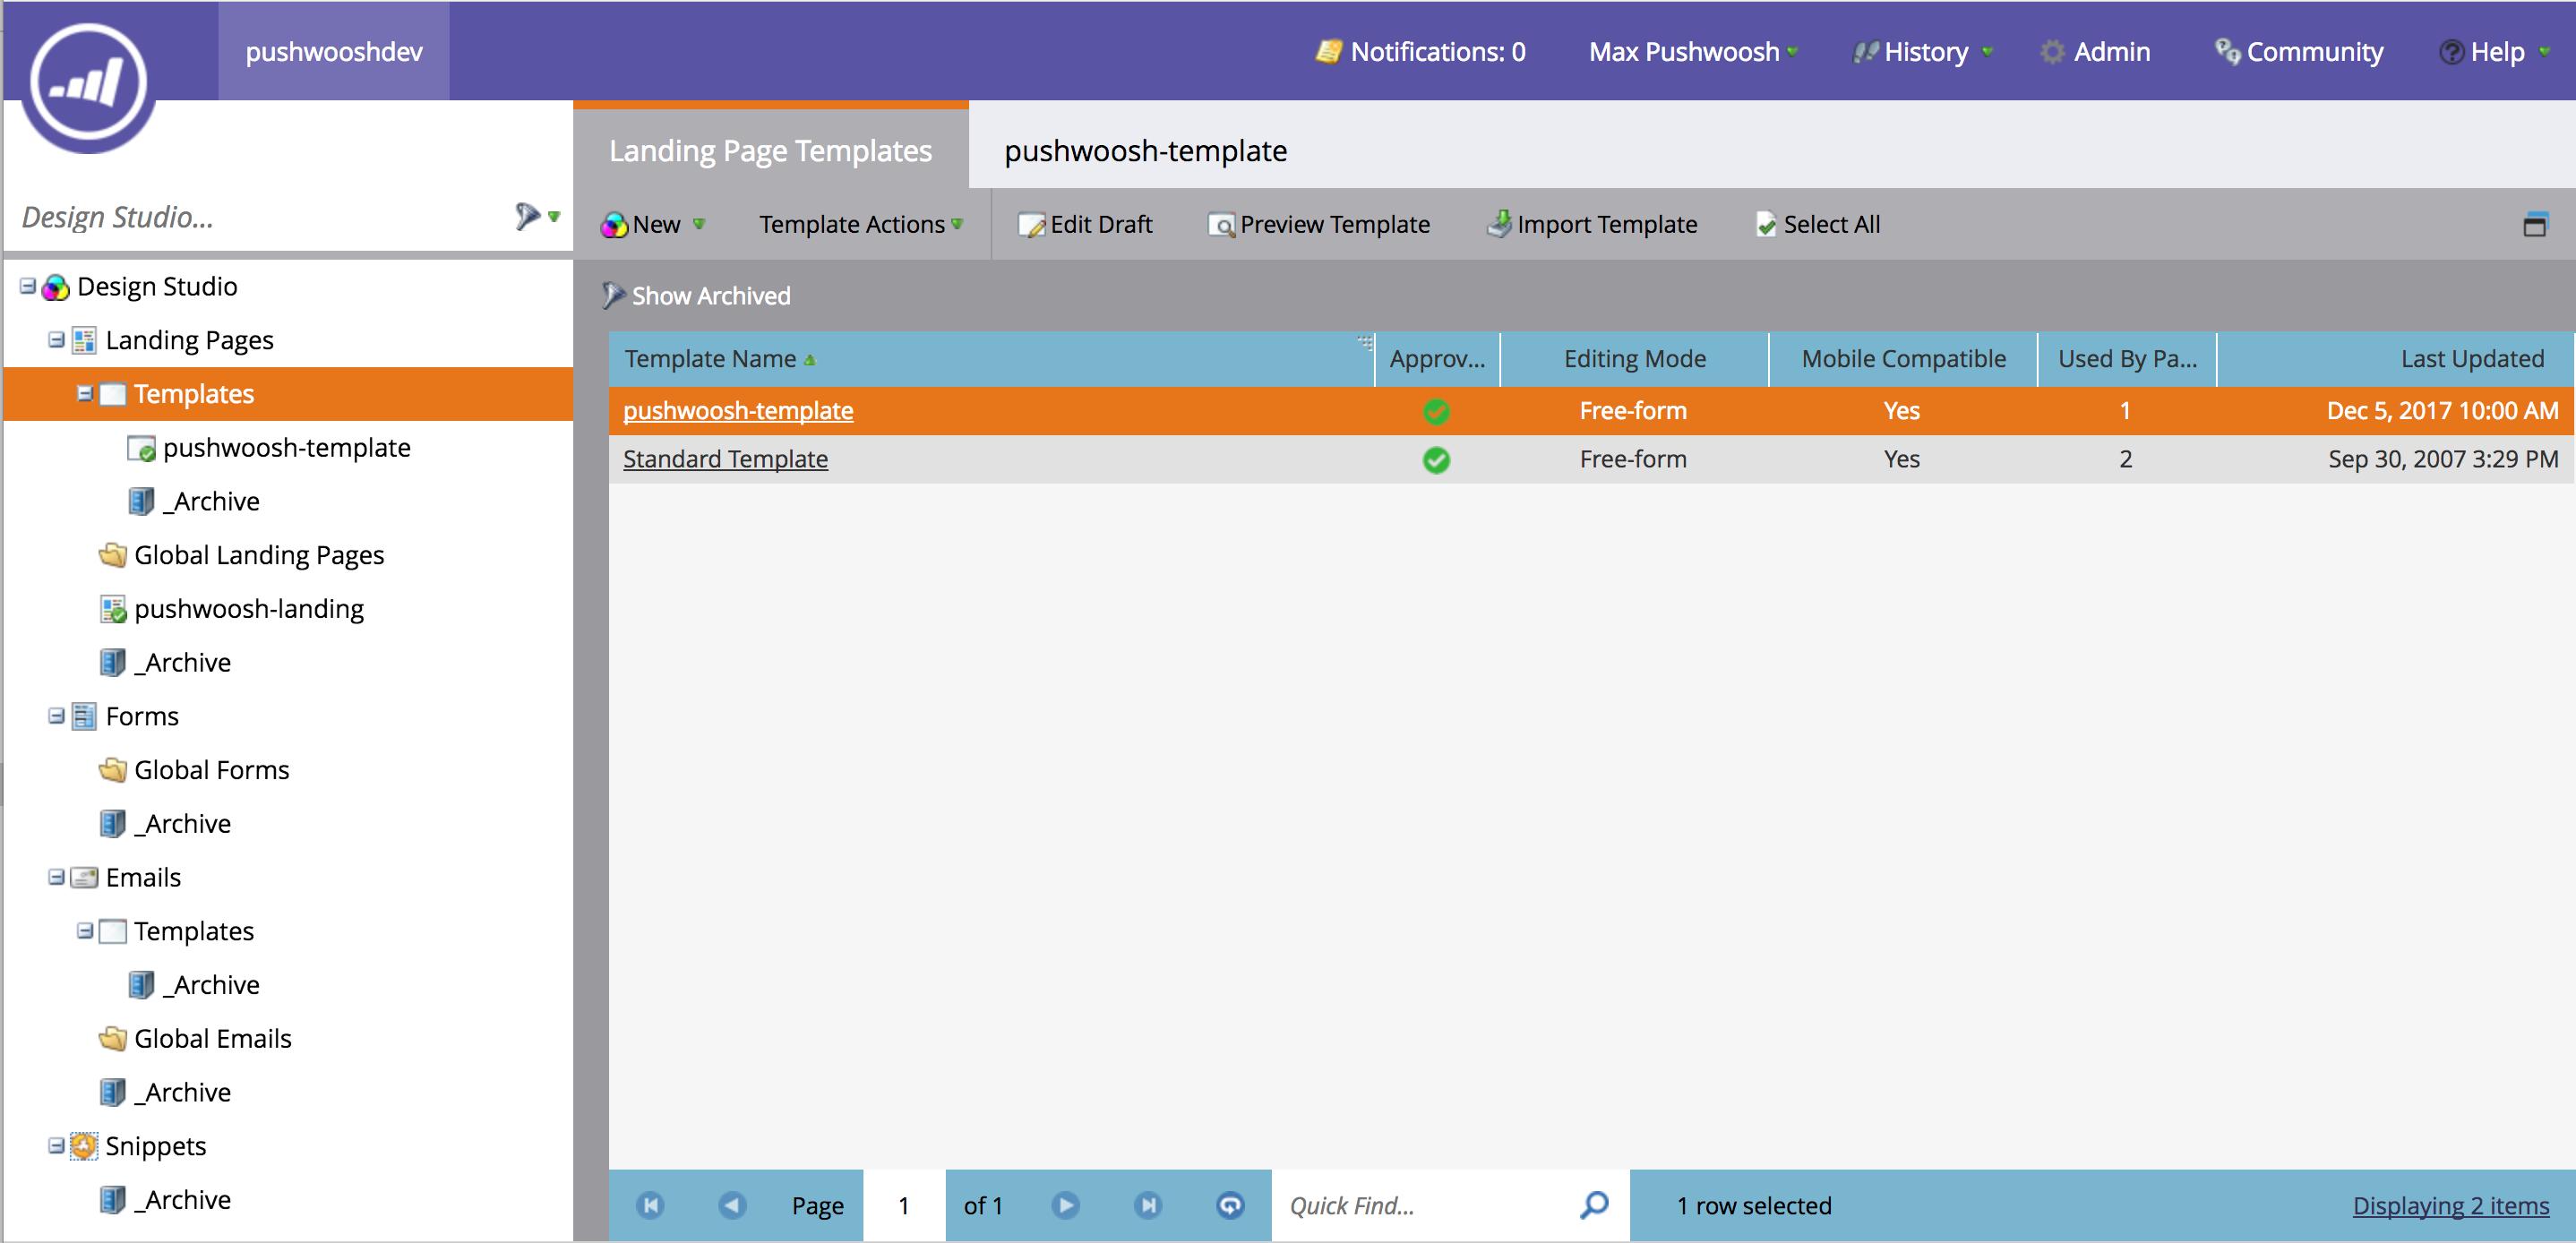 Marketo Integration - Marketo landing page templates